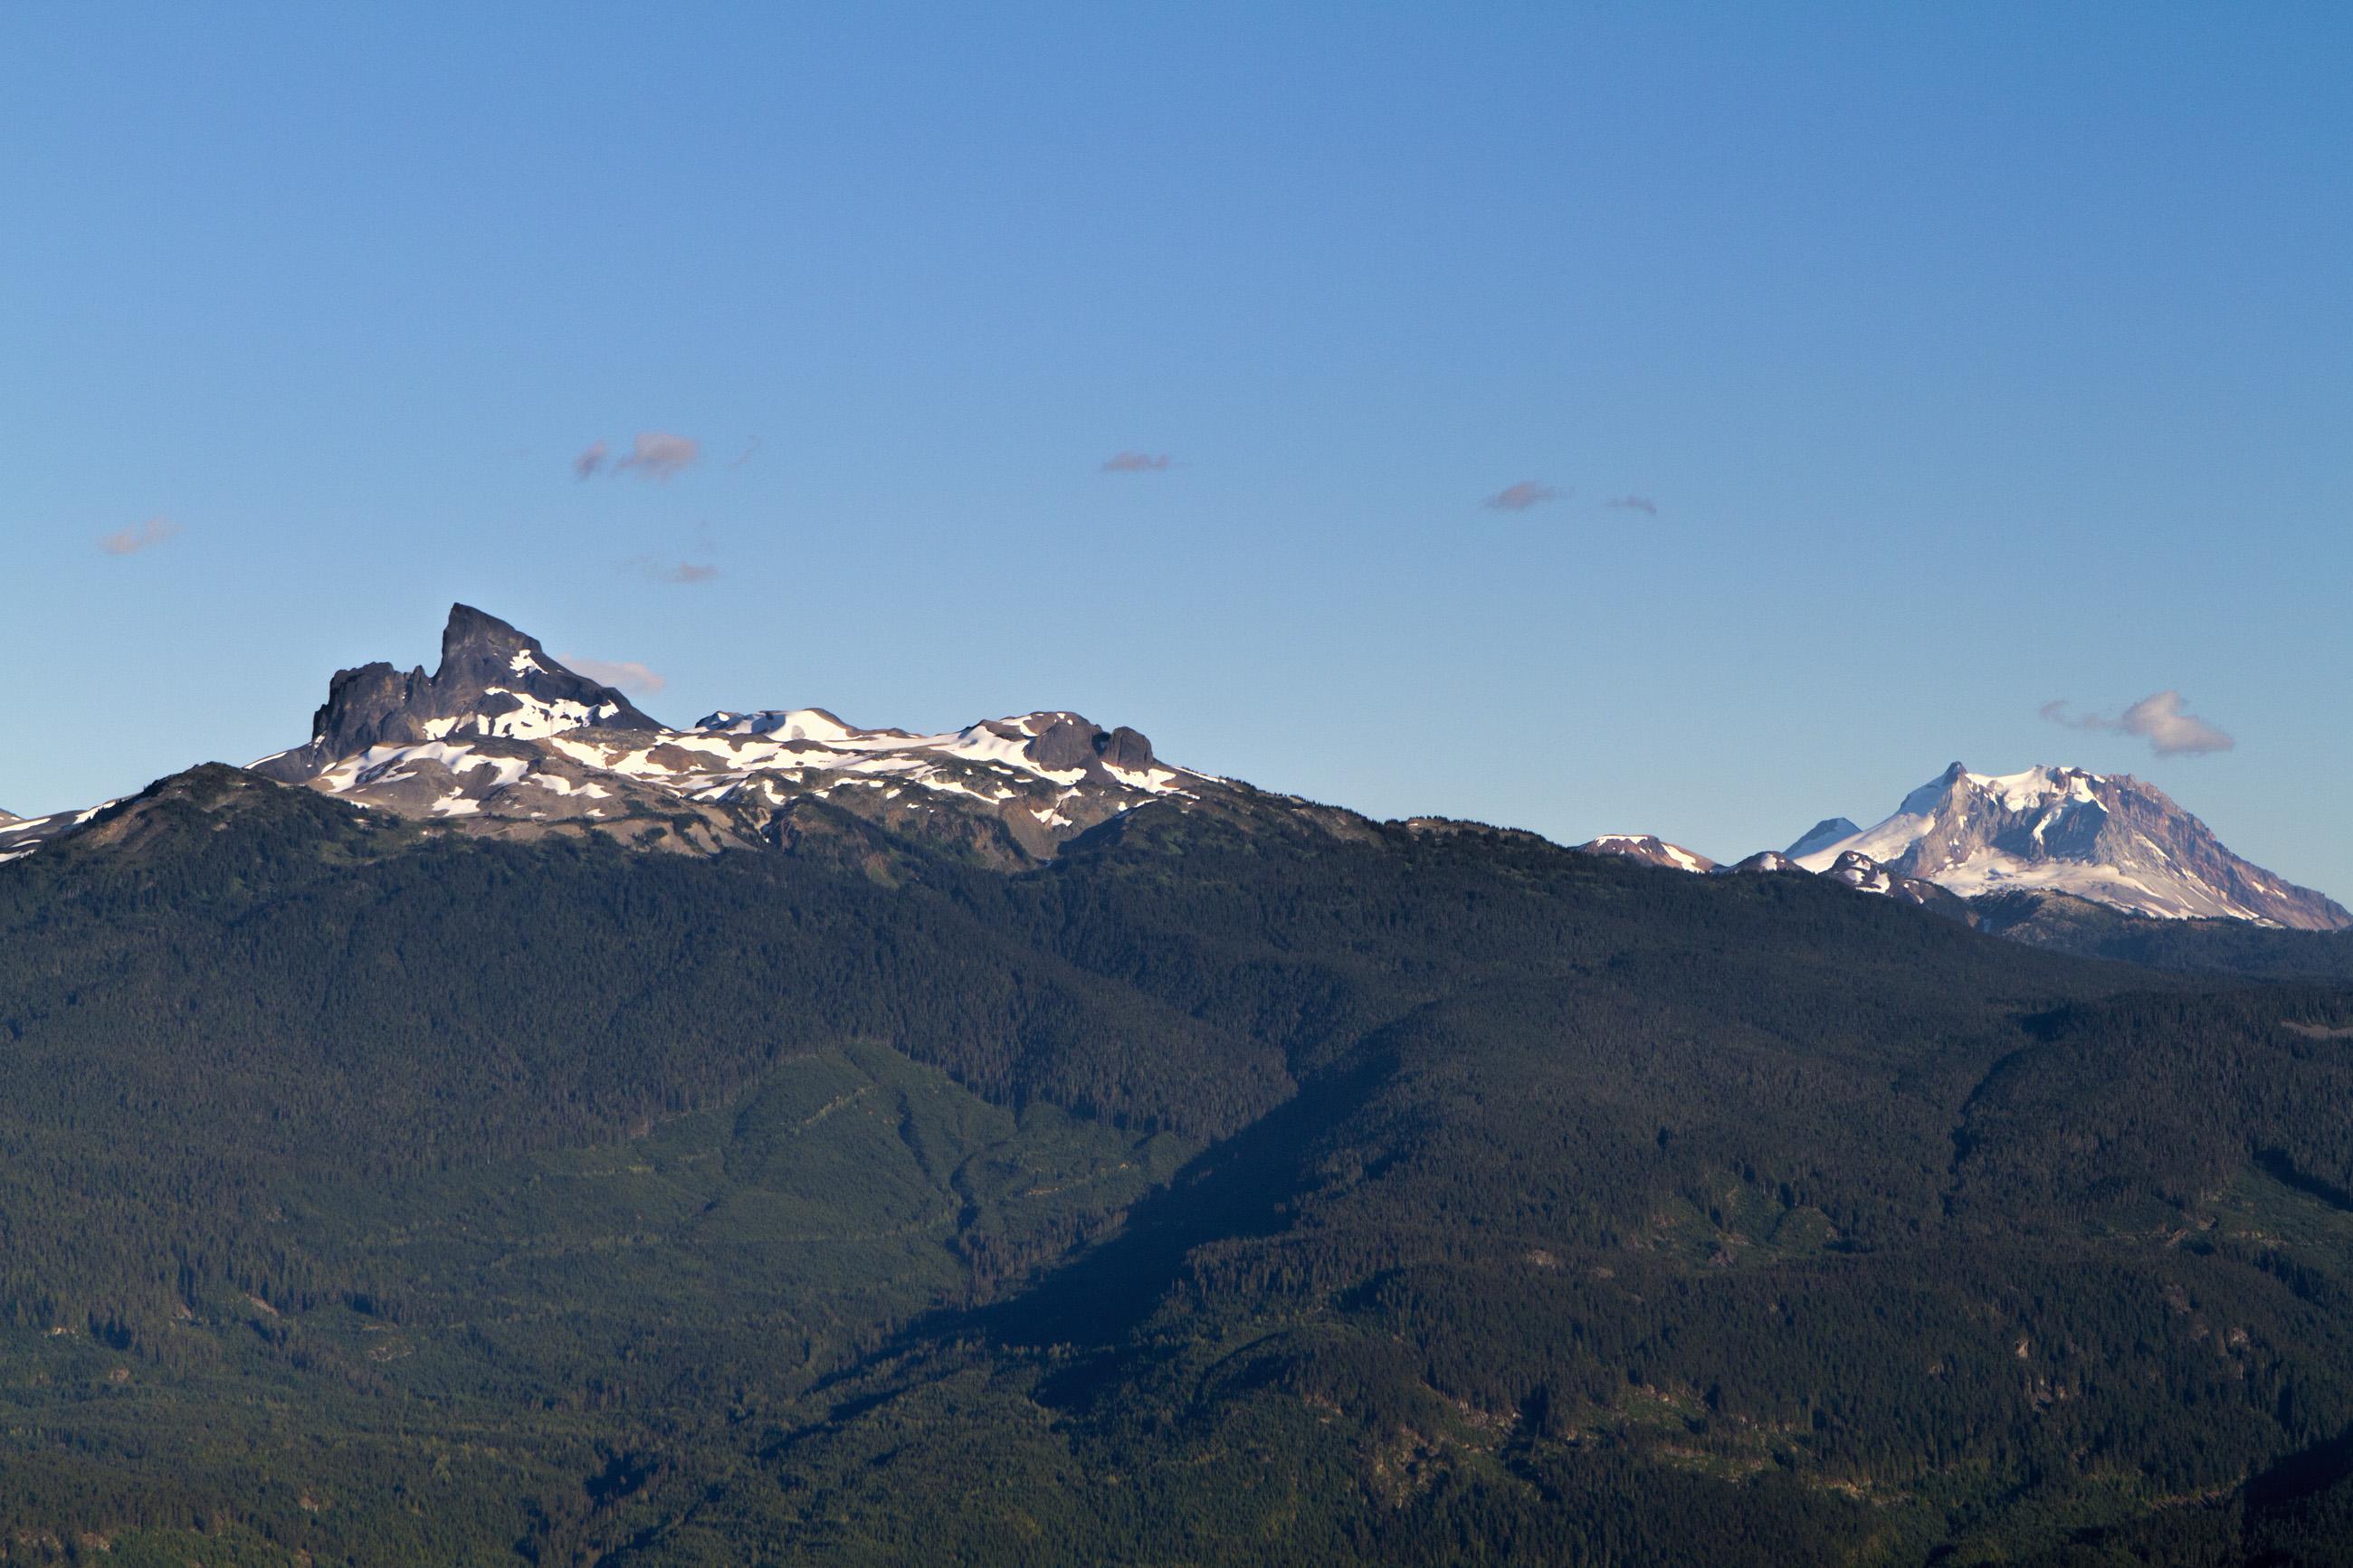 Mountain landscape photo